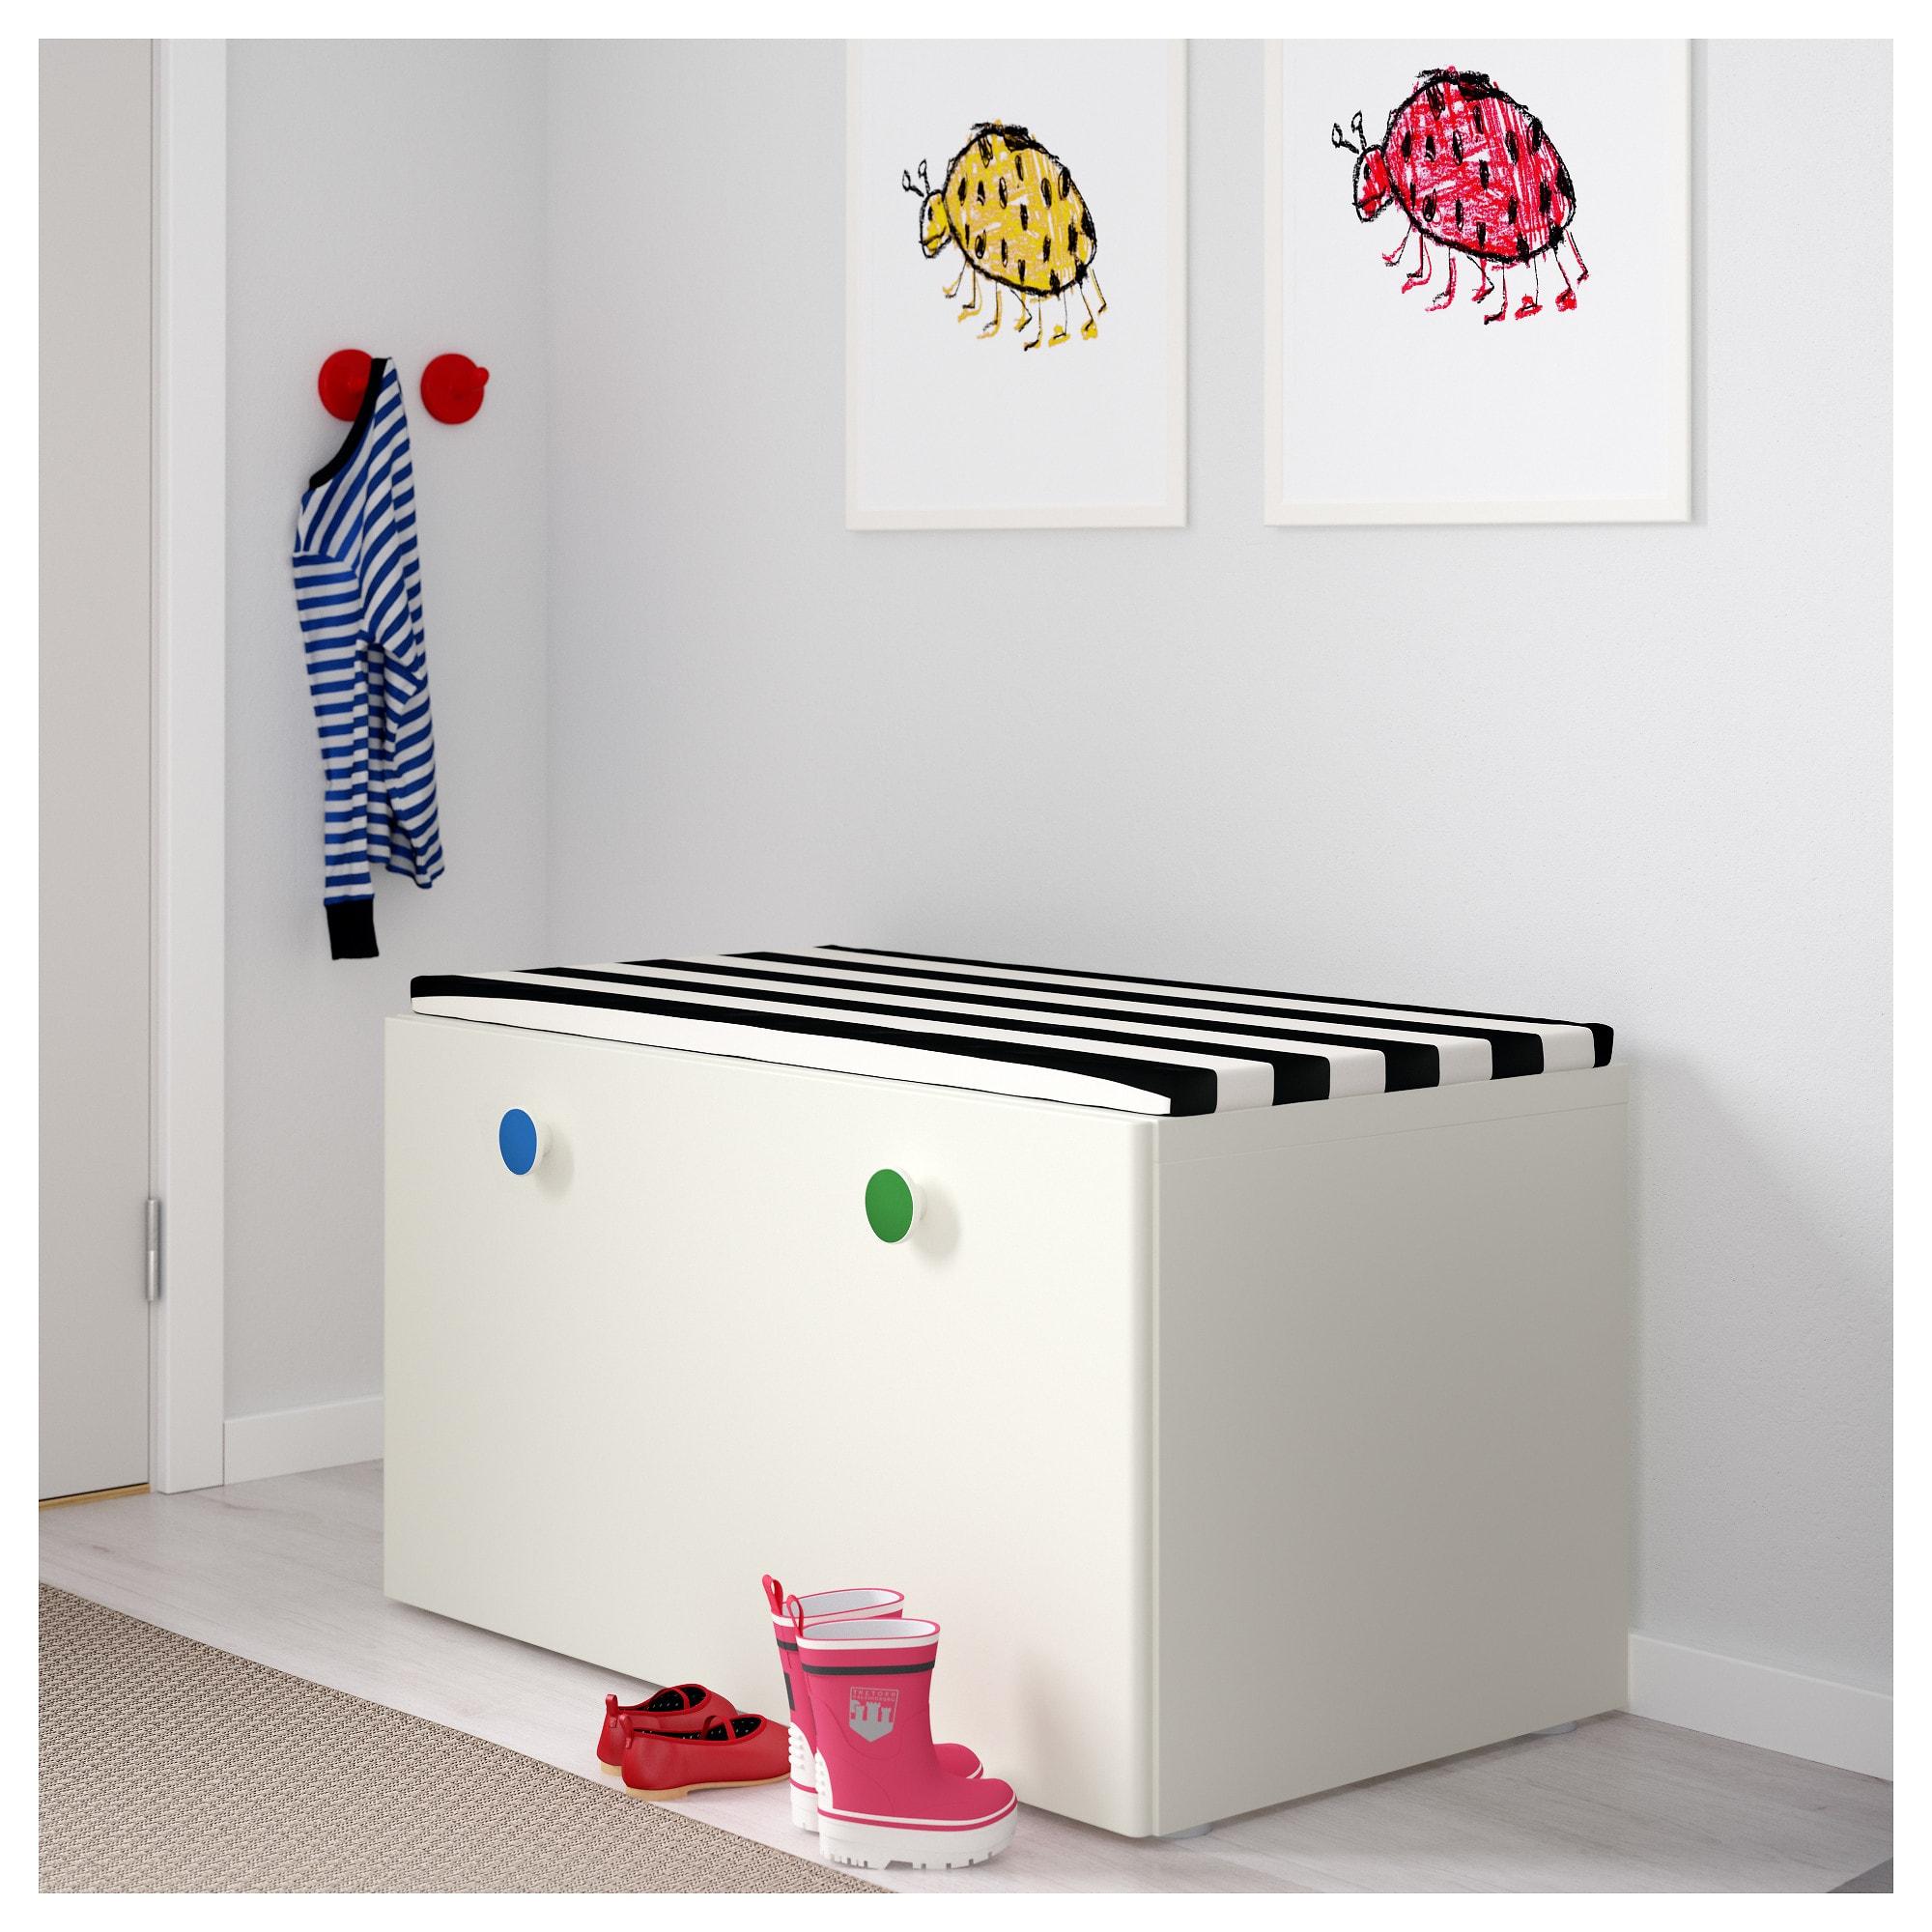 Stuva Folja Banktruhe Weiss Ikea Kindermobel Banktruhe Und